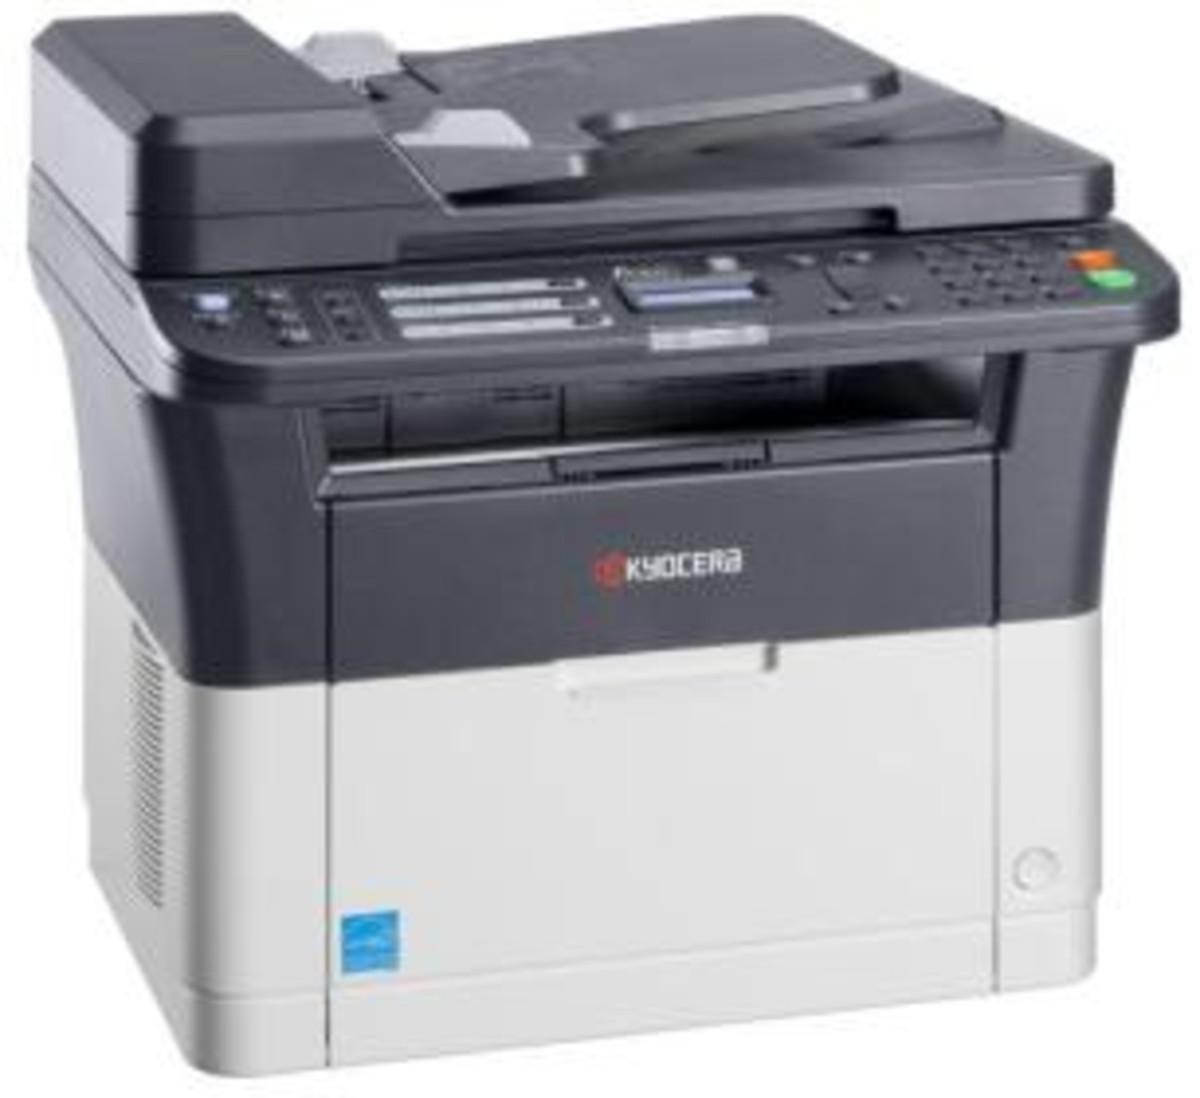 Kyocera FS1325 MFP Multifunction Mono-Laser Printer